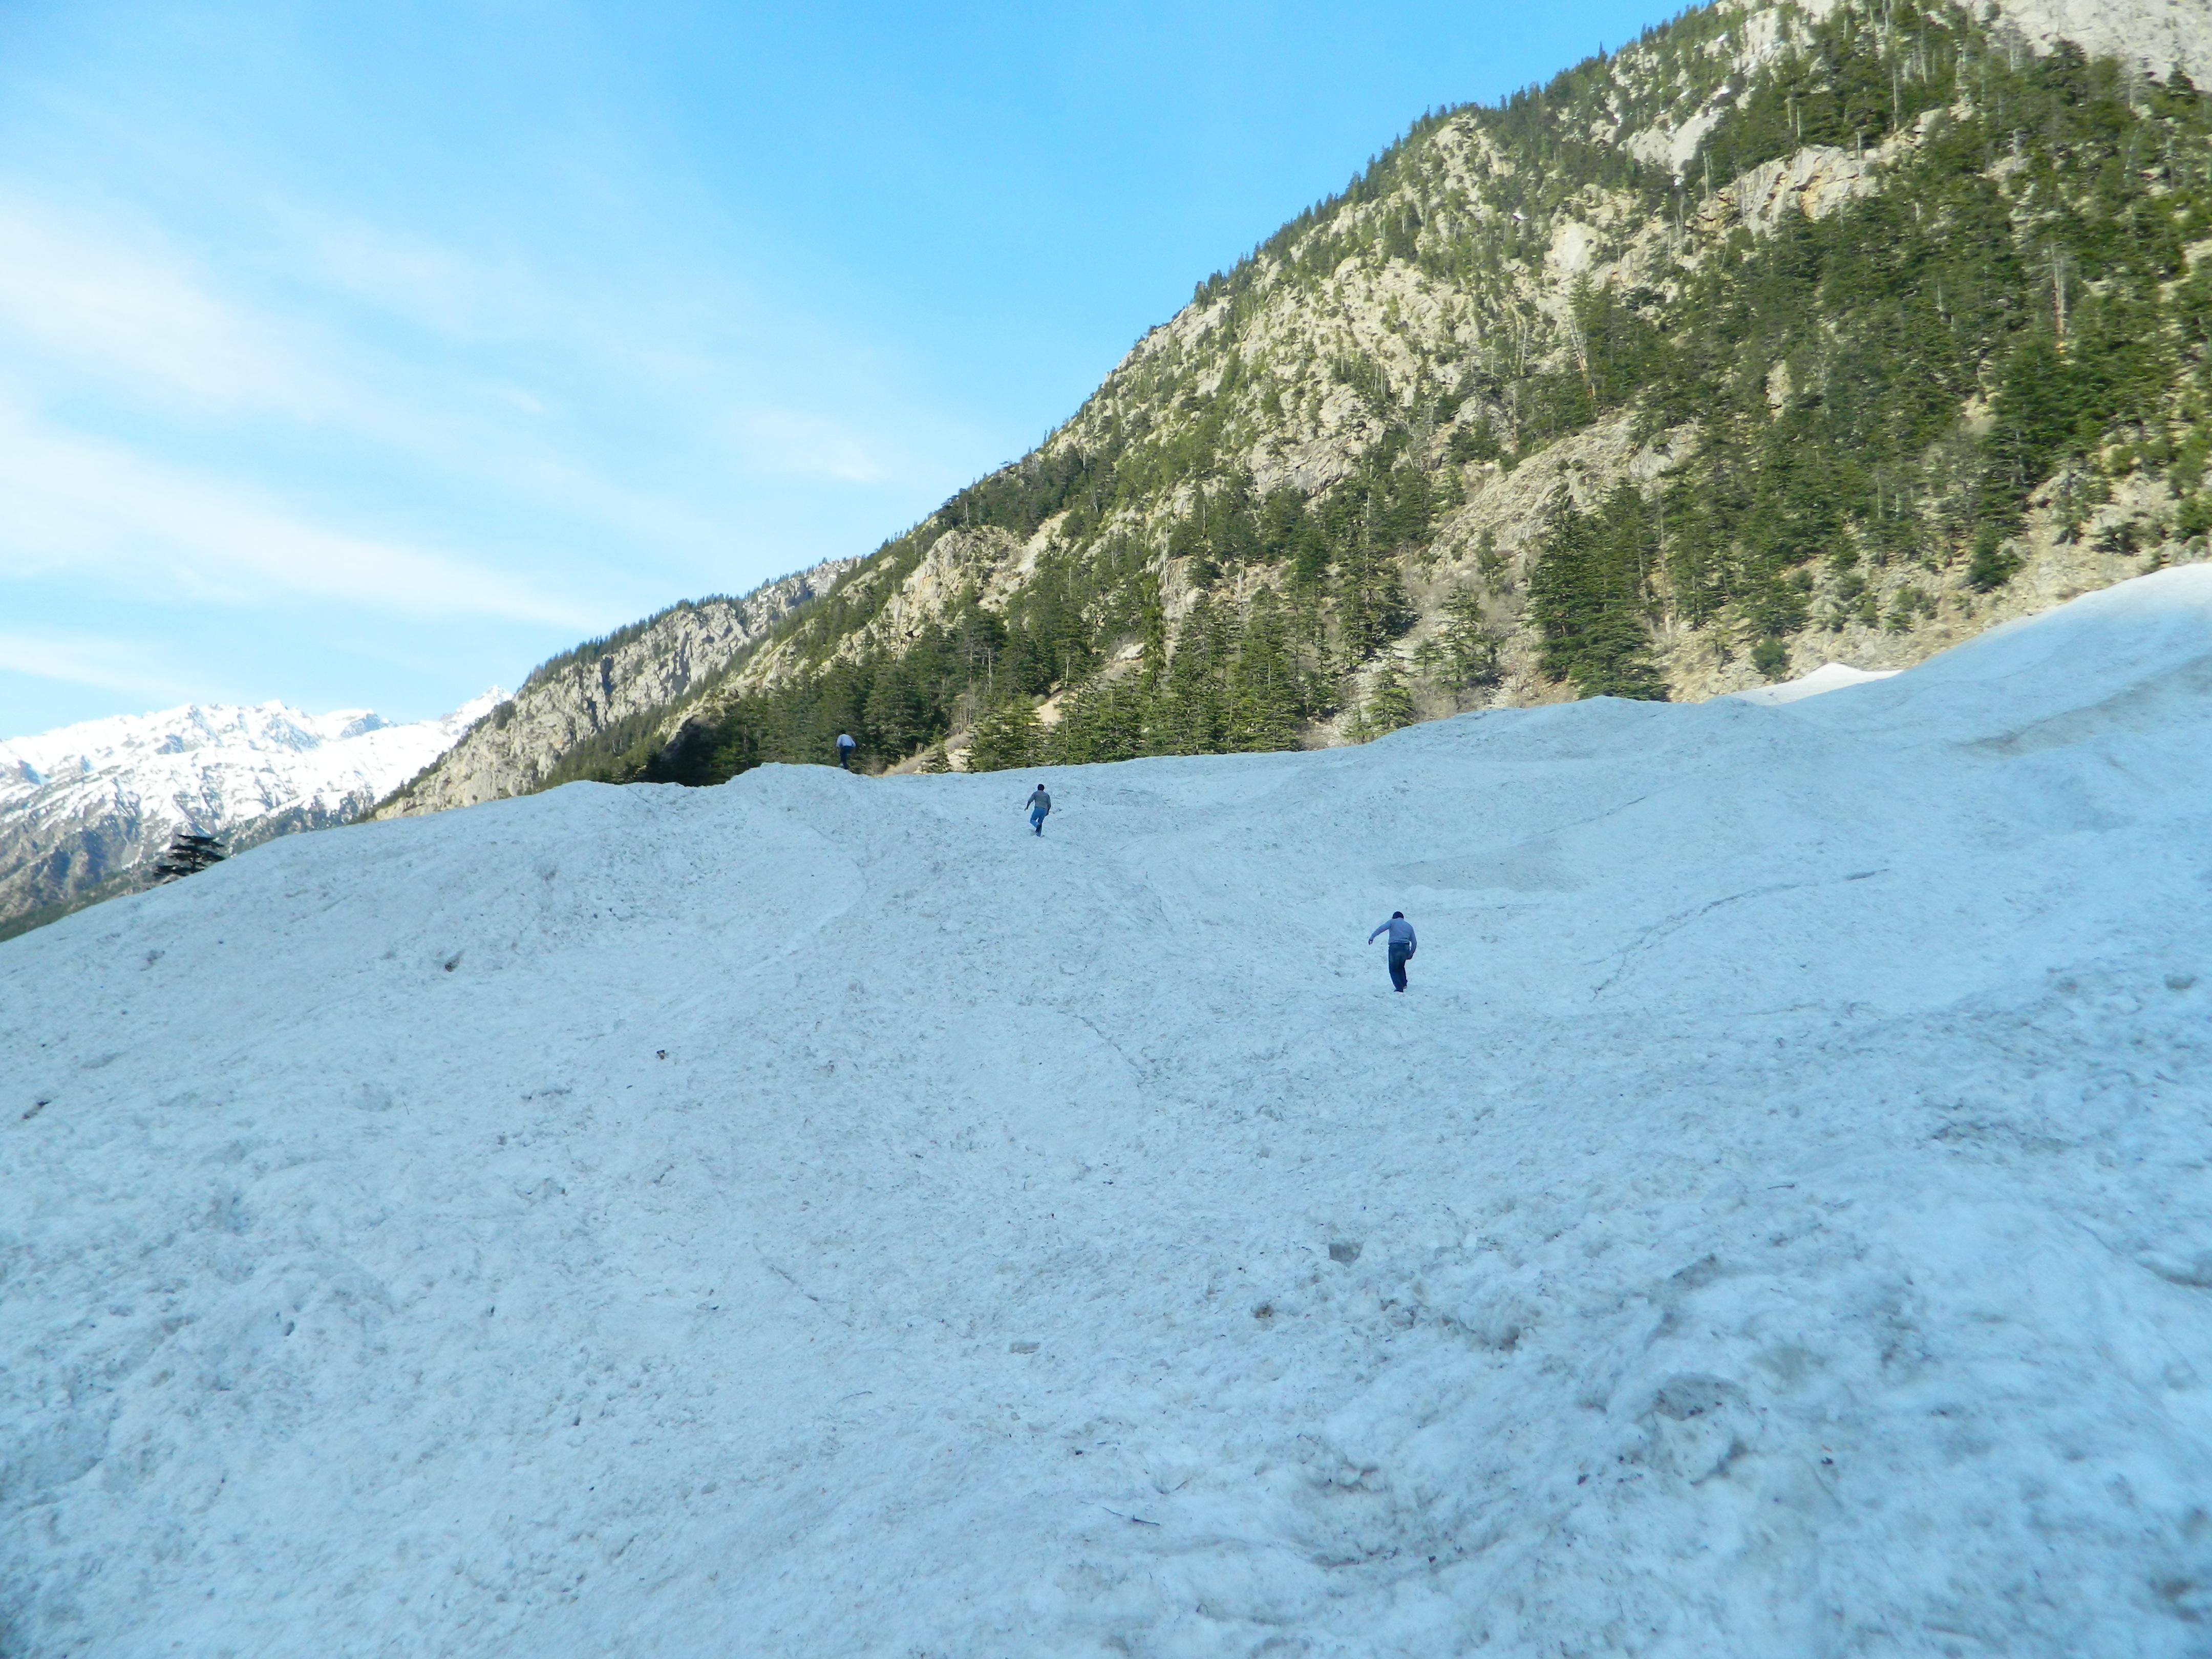 File:Glaciers in the Ushu Valley, Swat, Pakistan.jpg